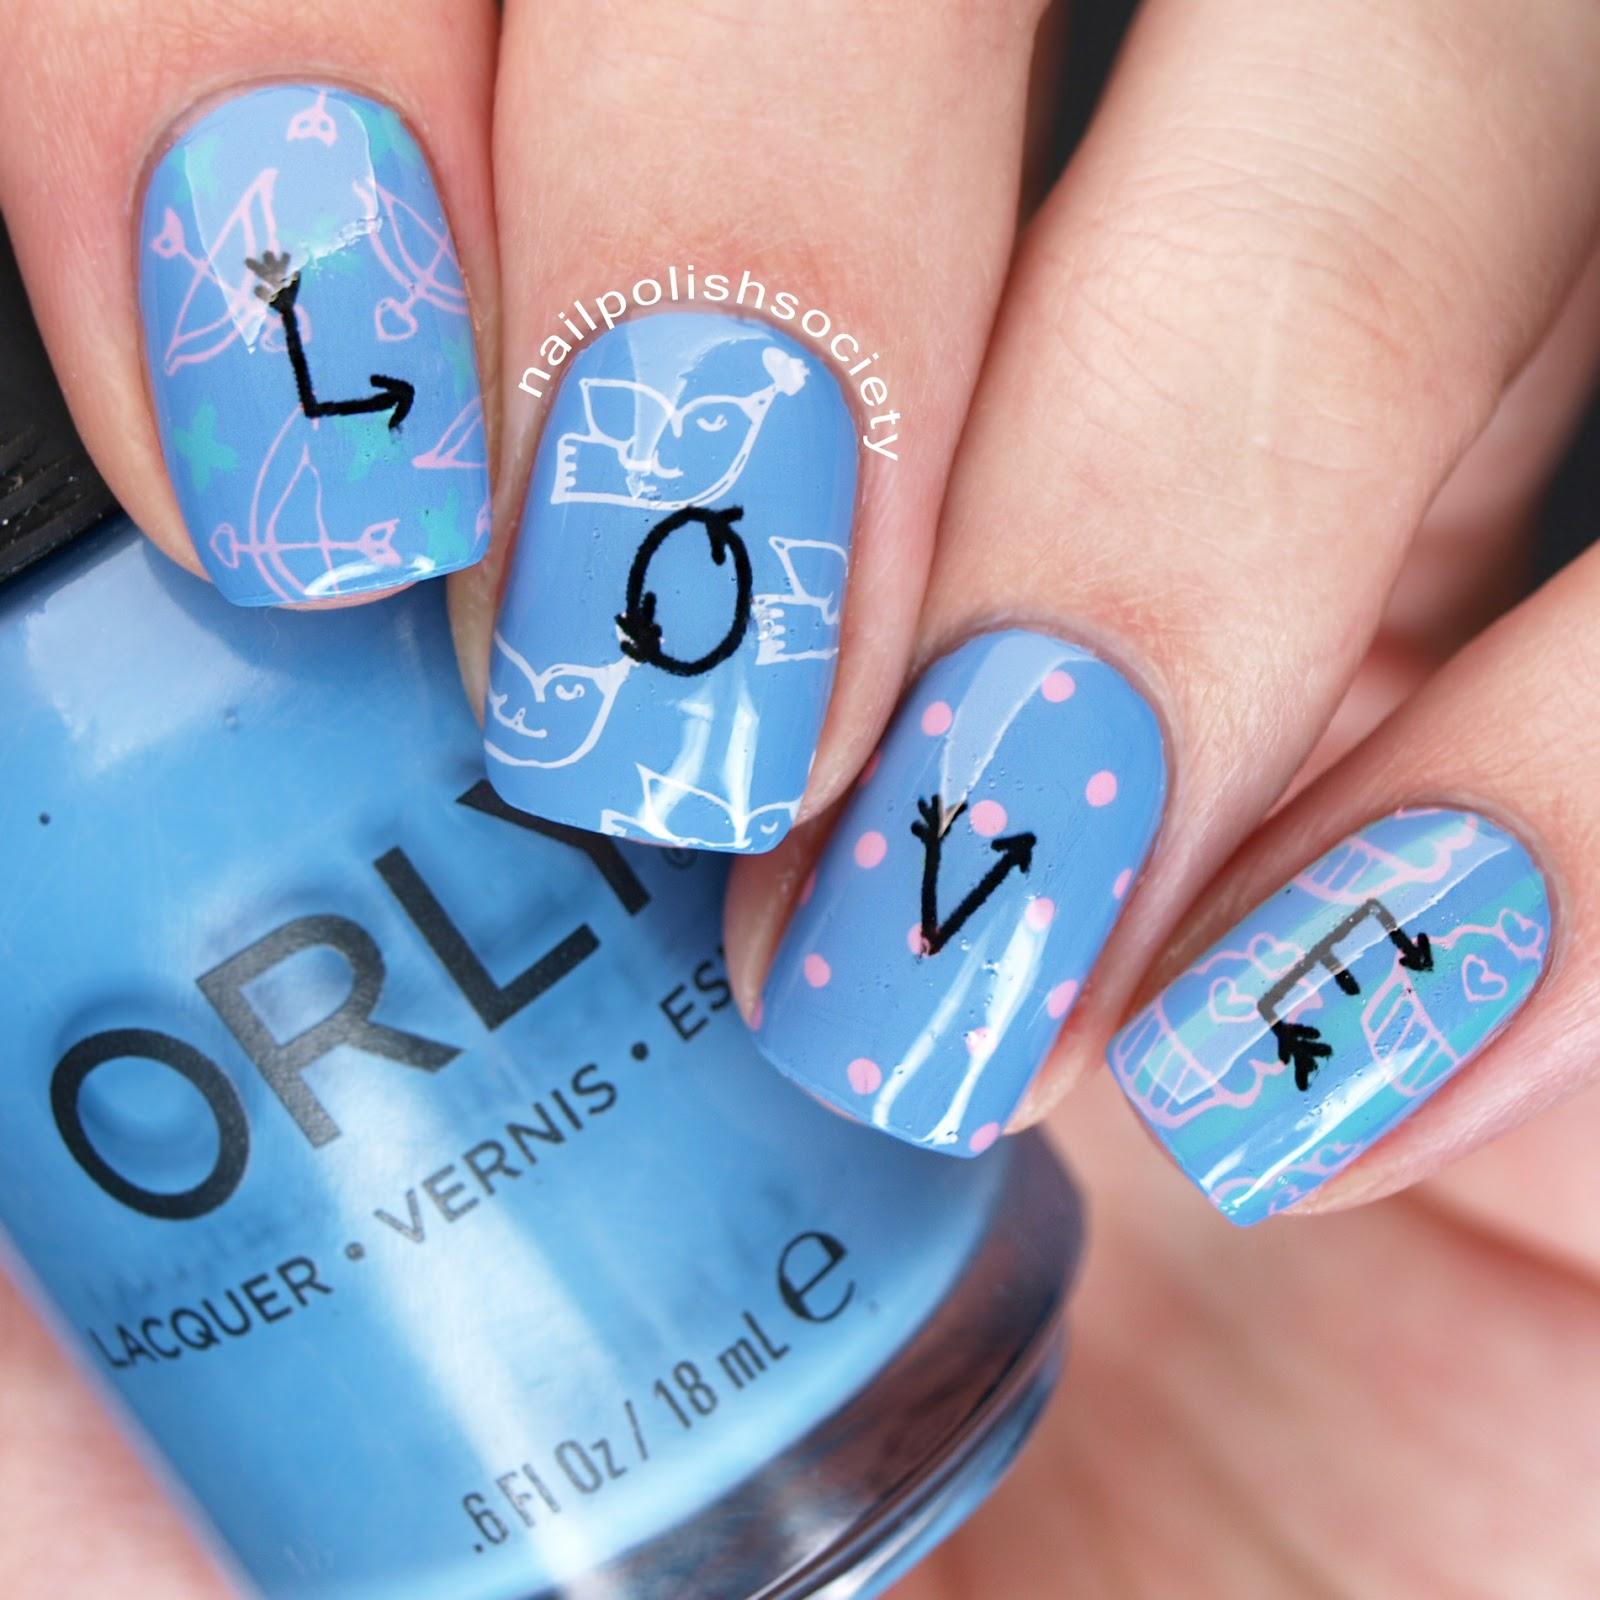 Nail polish society 40 great nail art ideas love 40 great nail art ideas love prinsesfo Choice Image